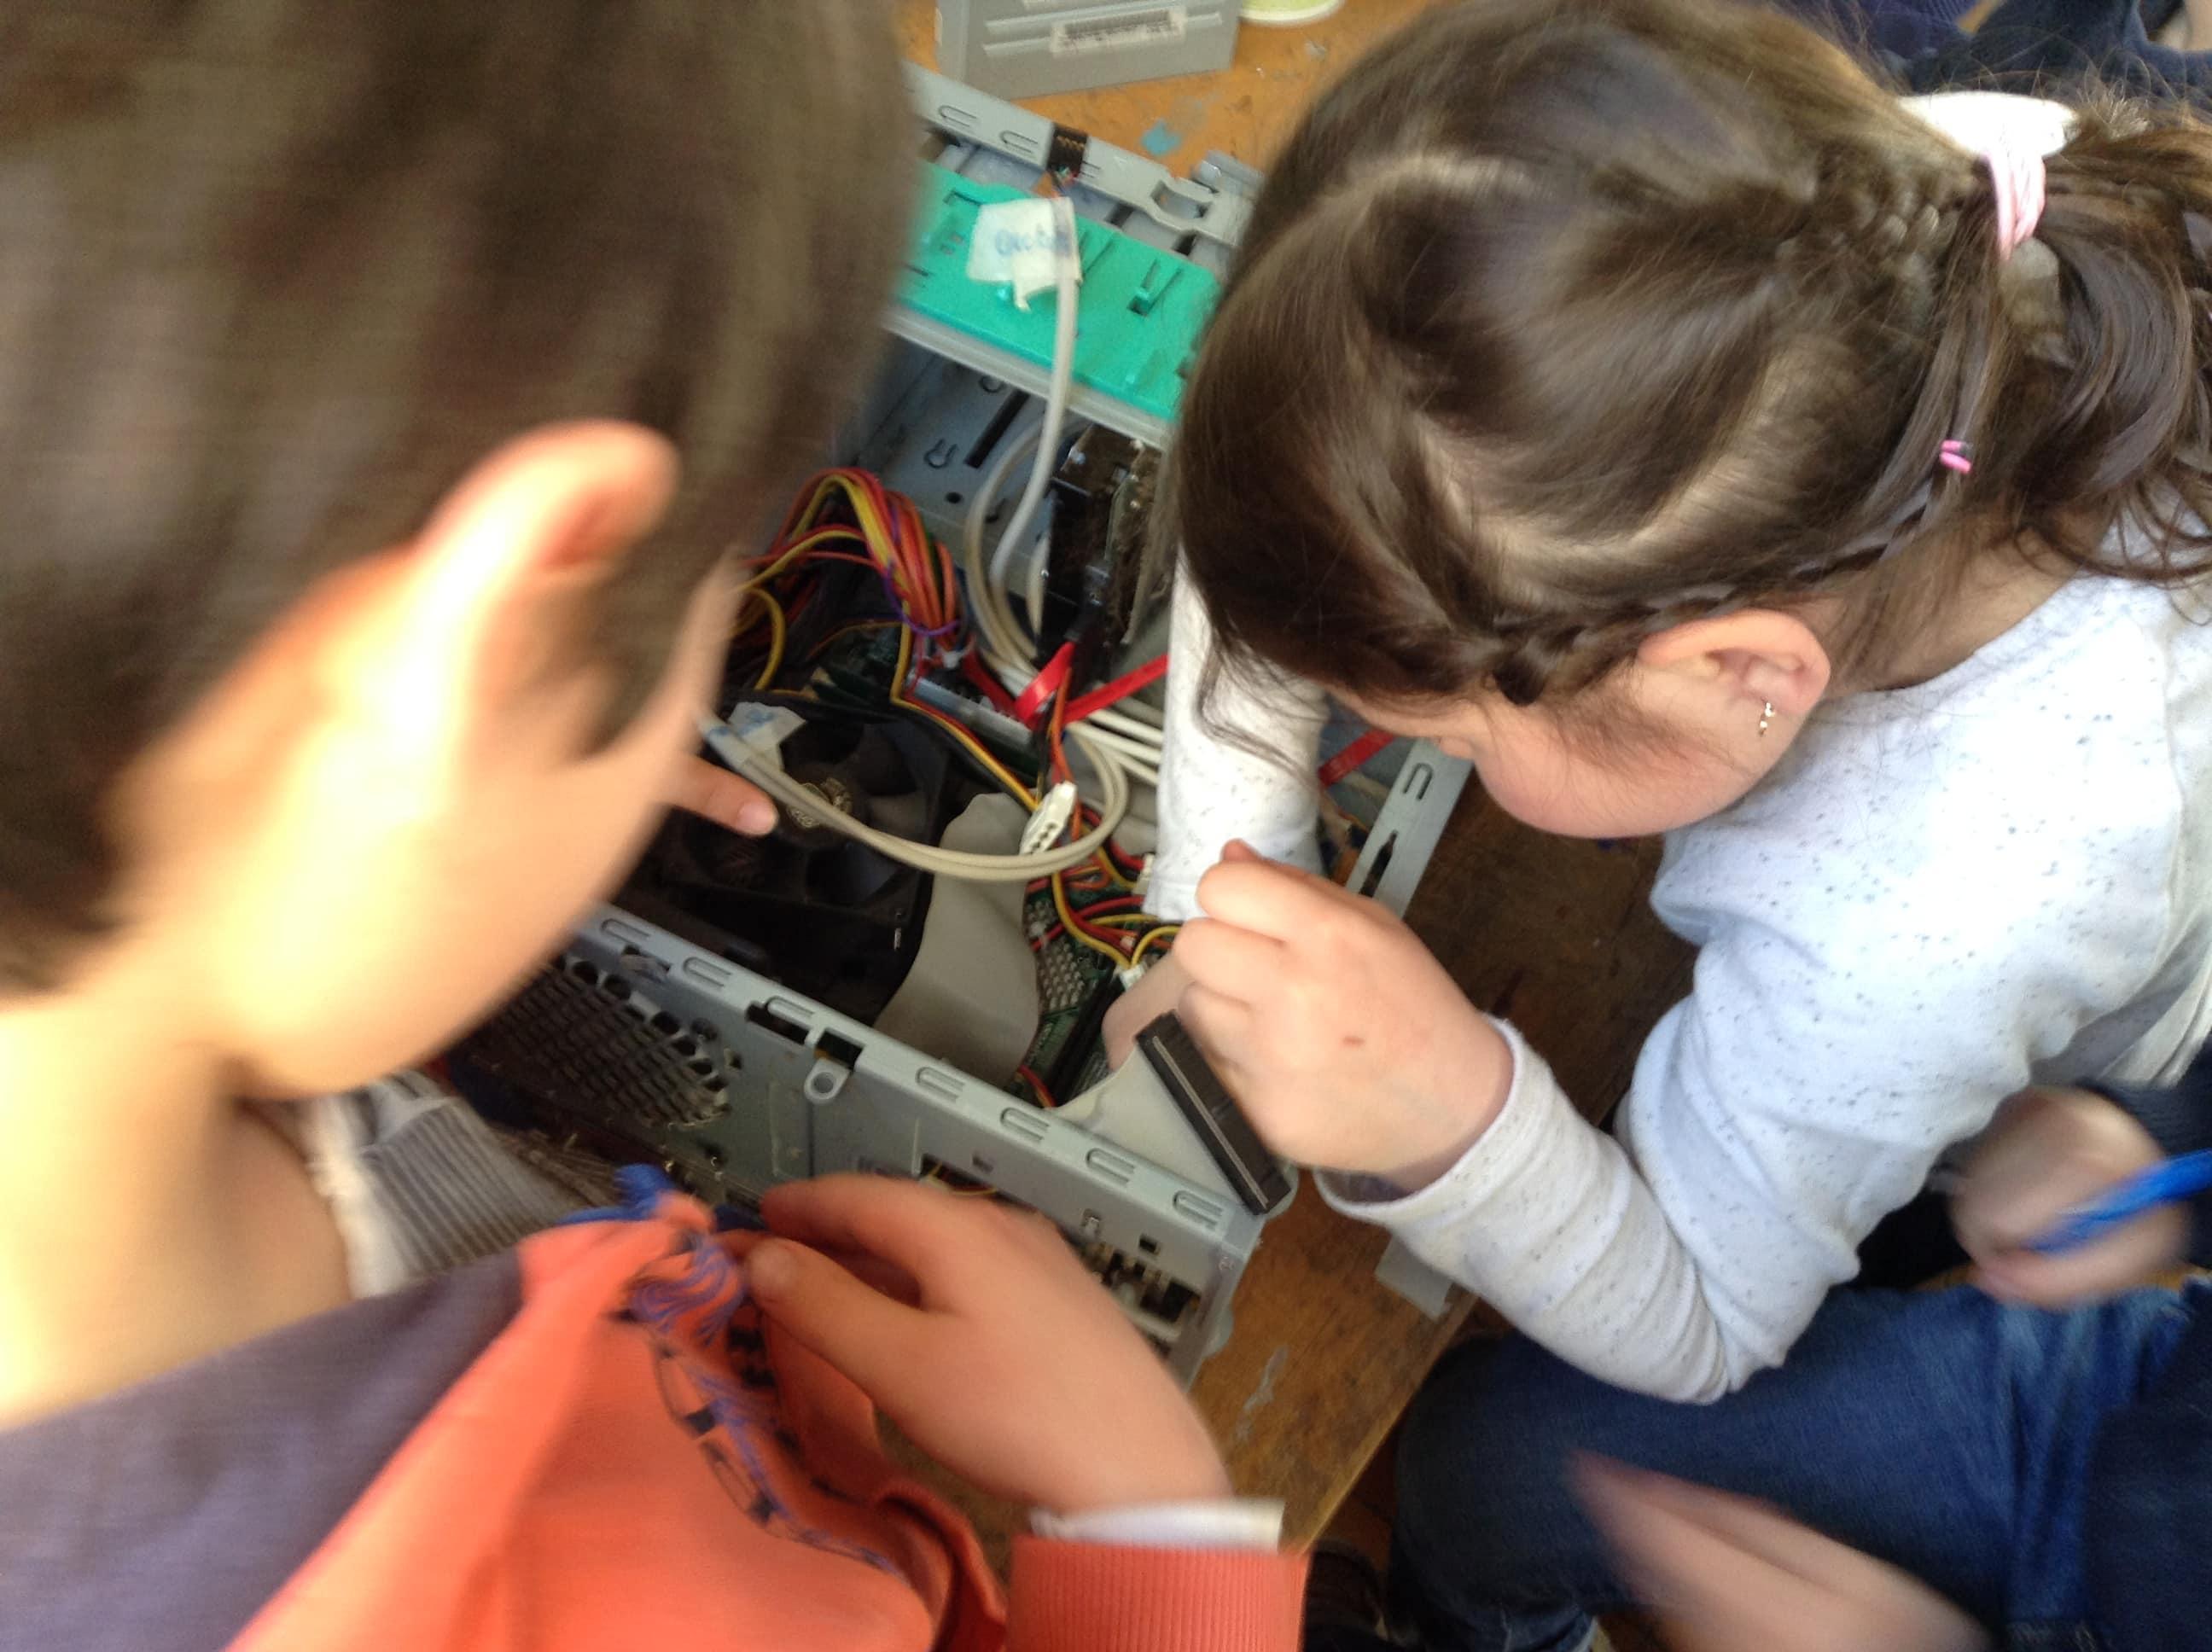 Projet OMNI trimestre 2 - club science - Quimper